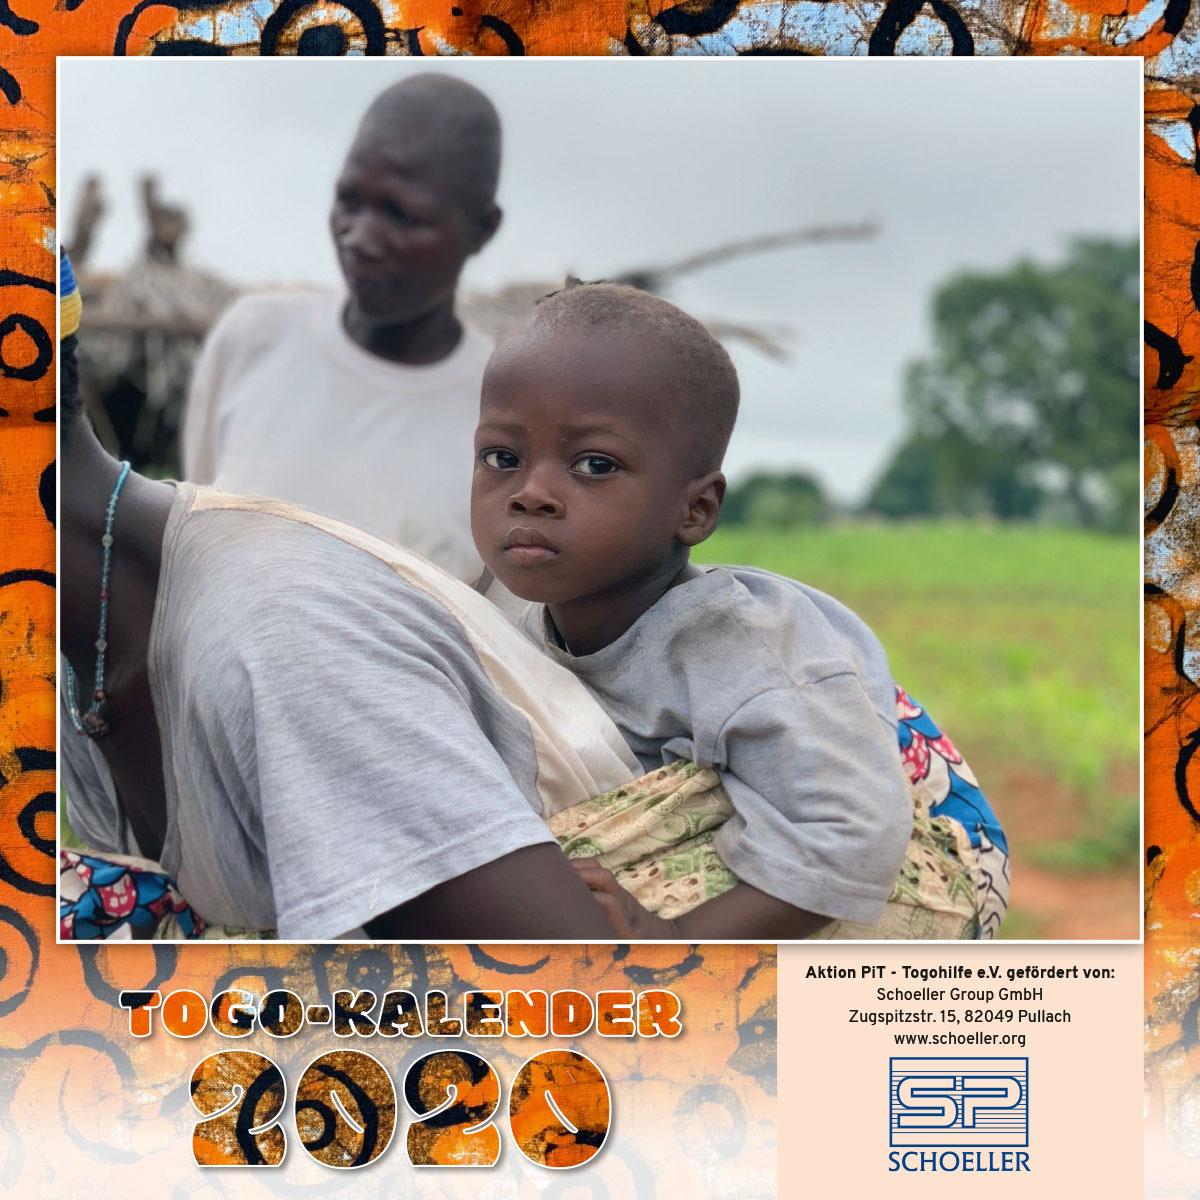 Togo-Kalender 2020, das Titelblatt